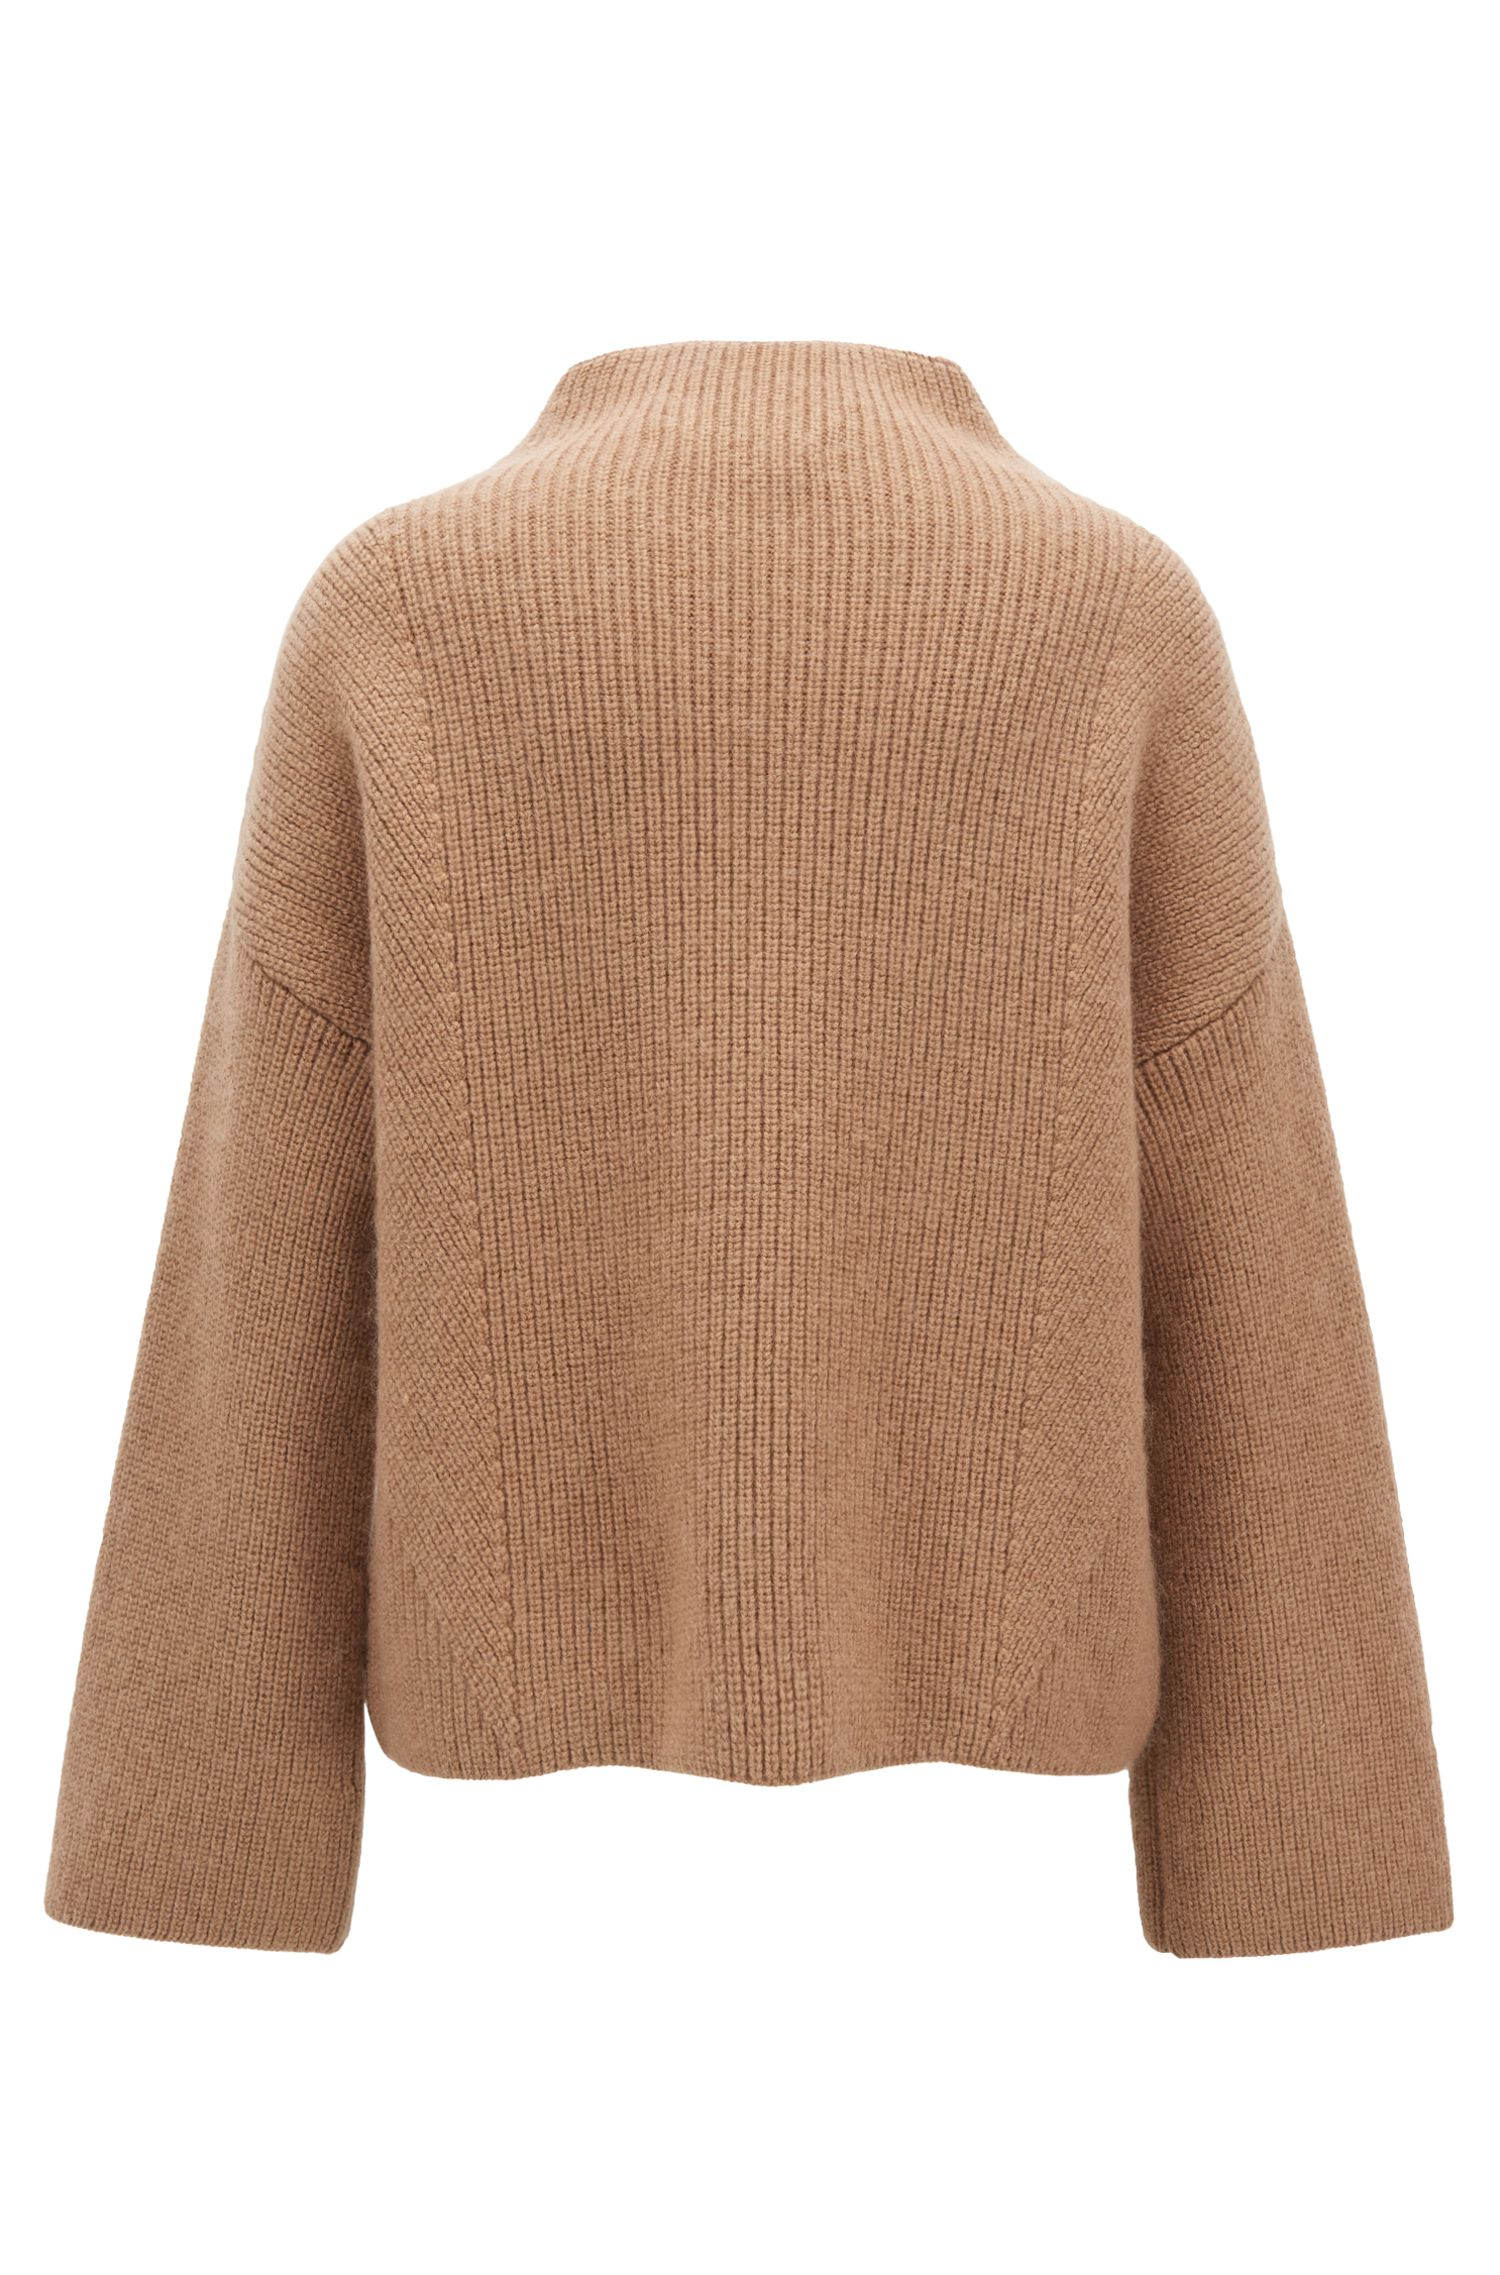 Made in Germany sweater in an Italian virgin-wool blend, Brown